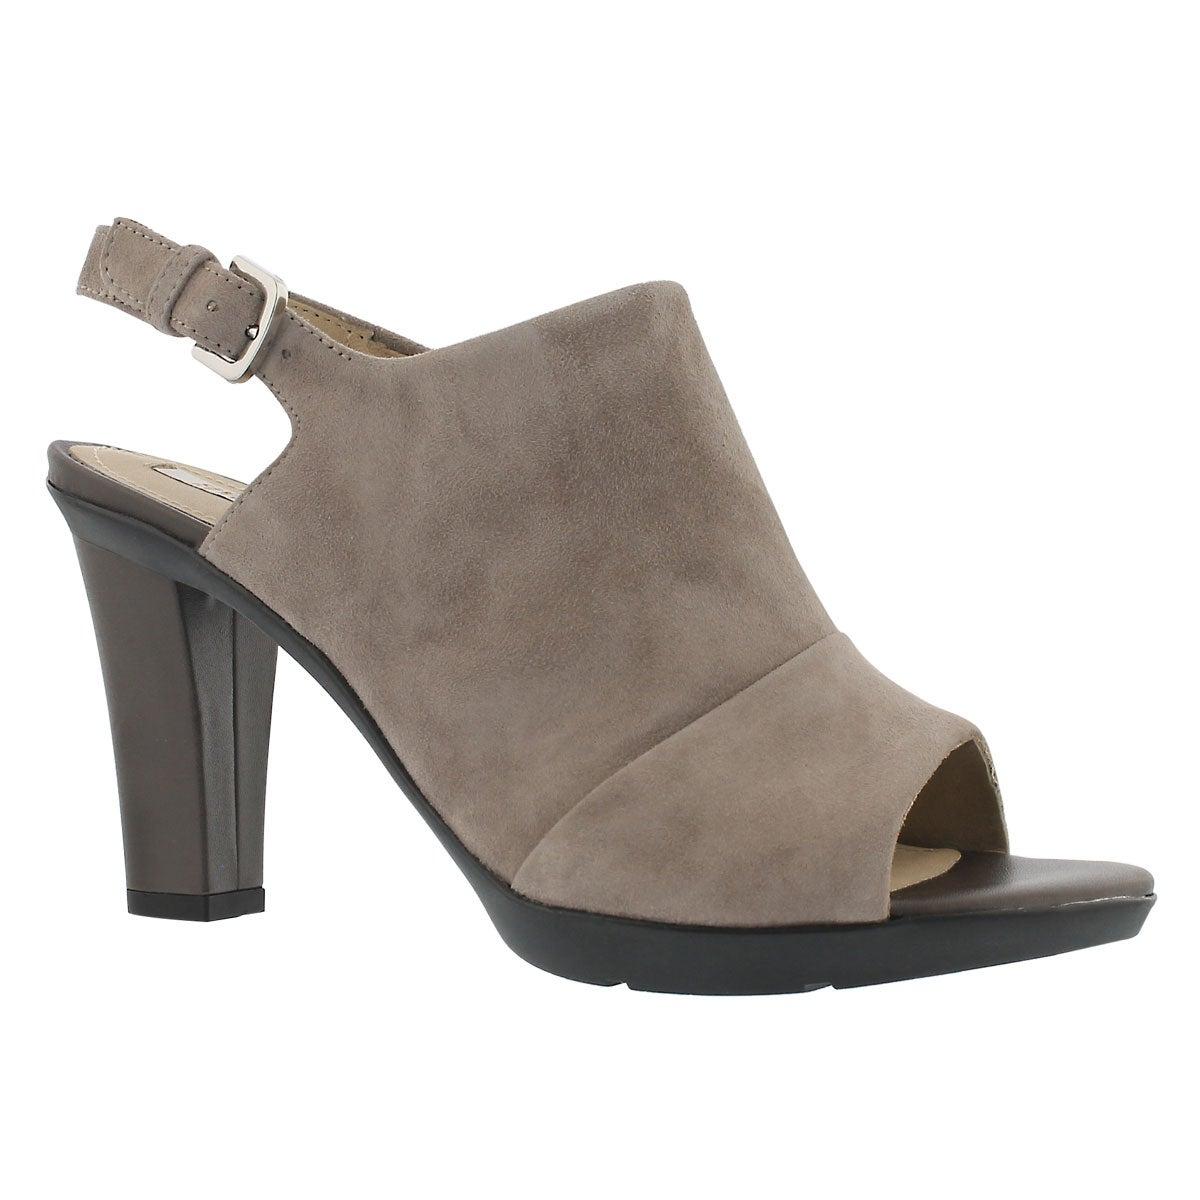 Women's JADALIS taupe dress sandals